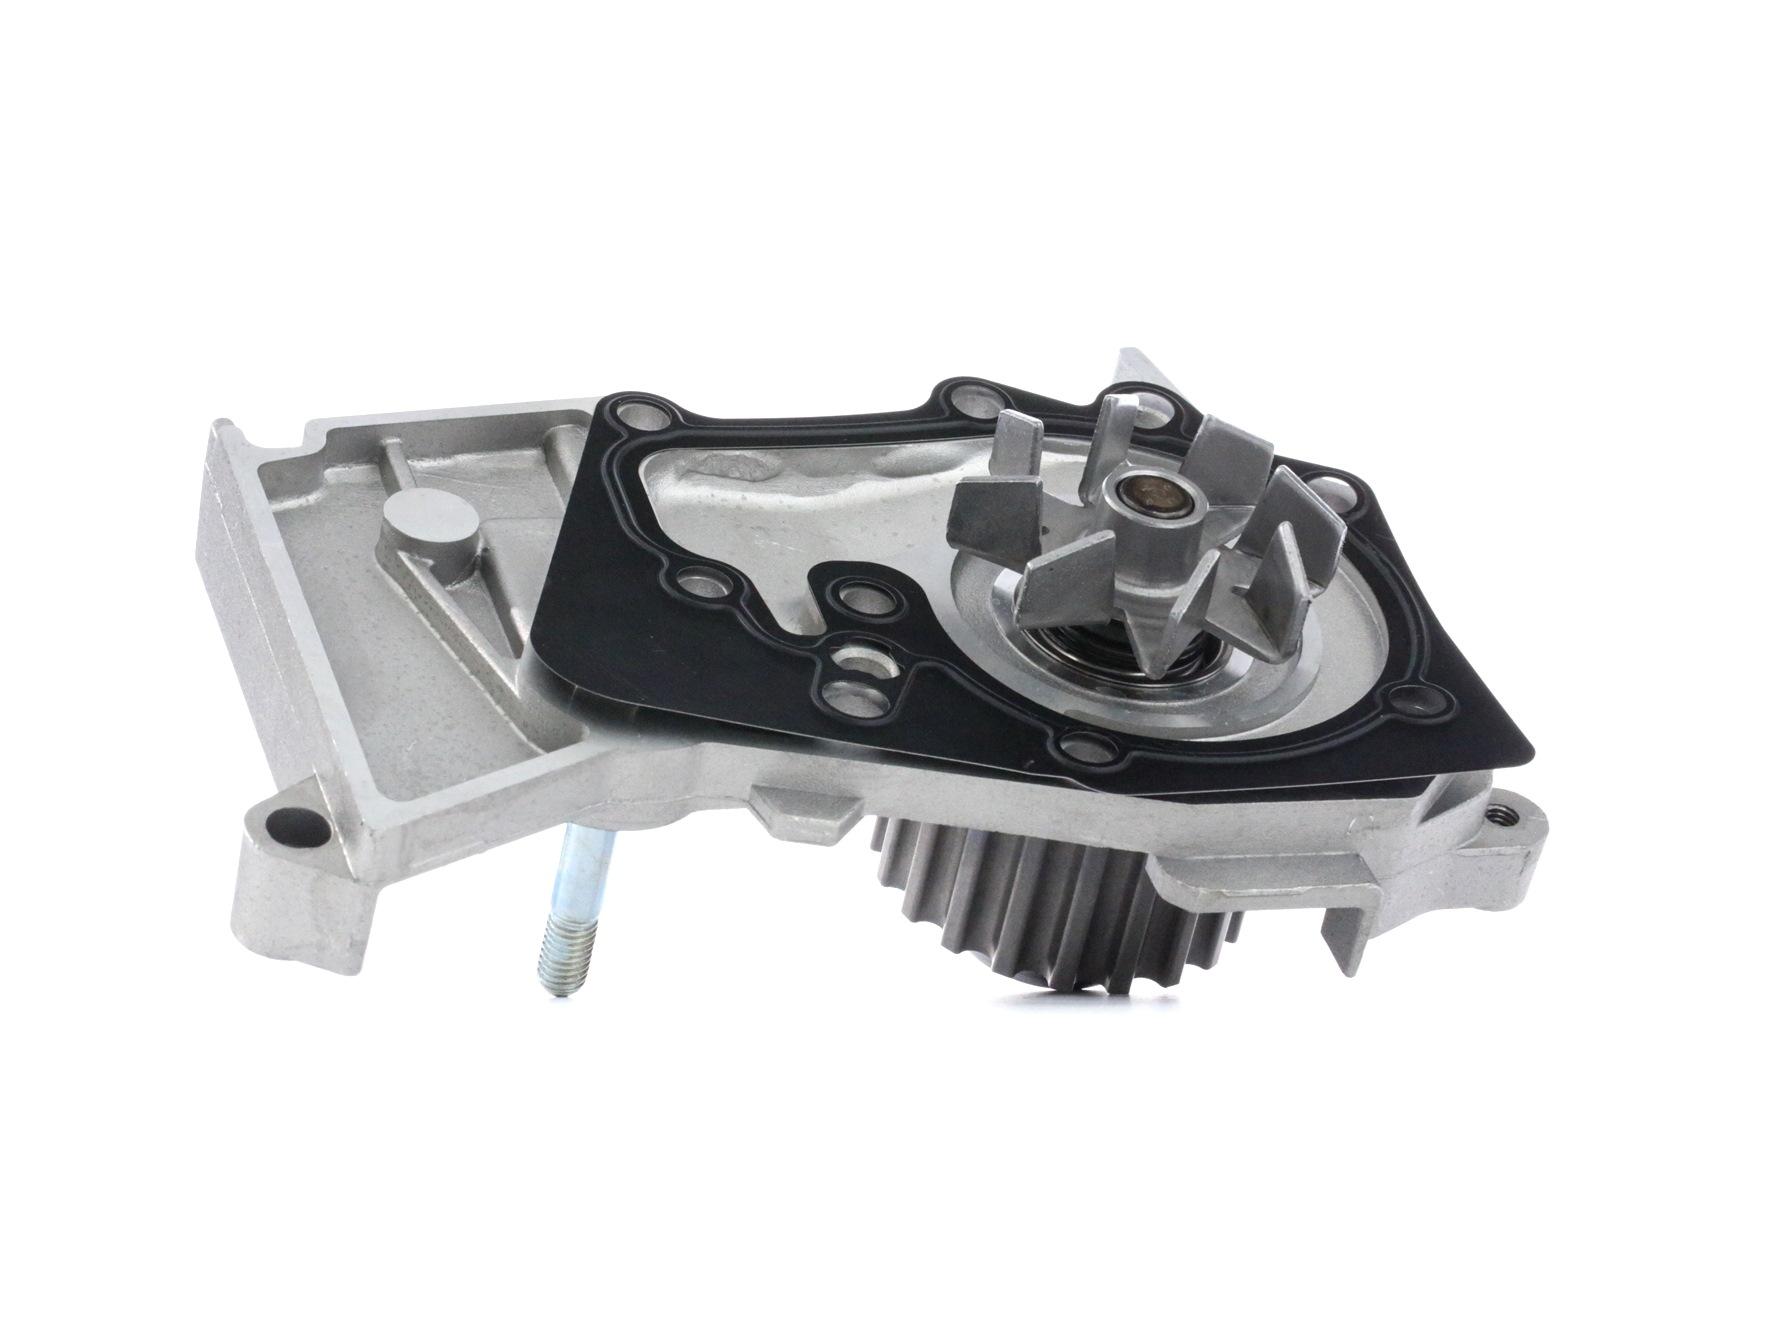 SKF VKPC 86416 () : Refroidissement Renault Kangoo kc01 2012